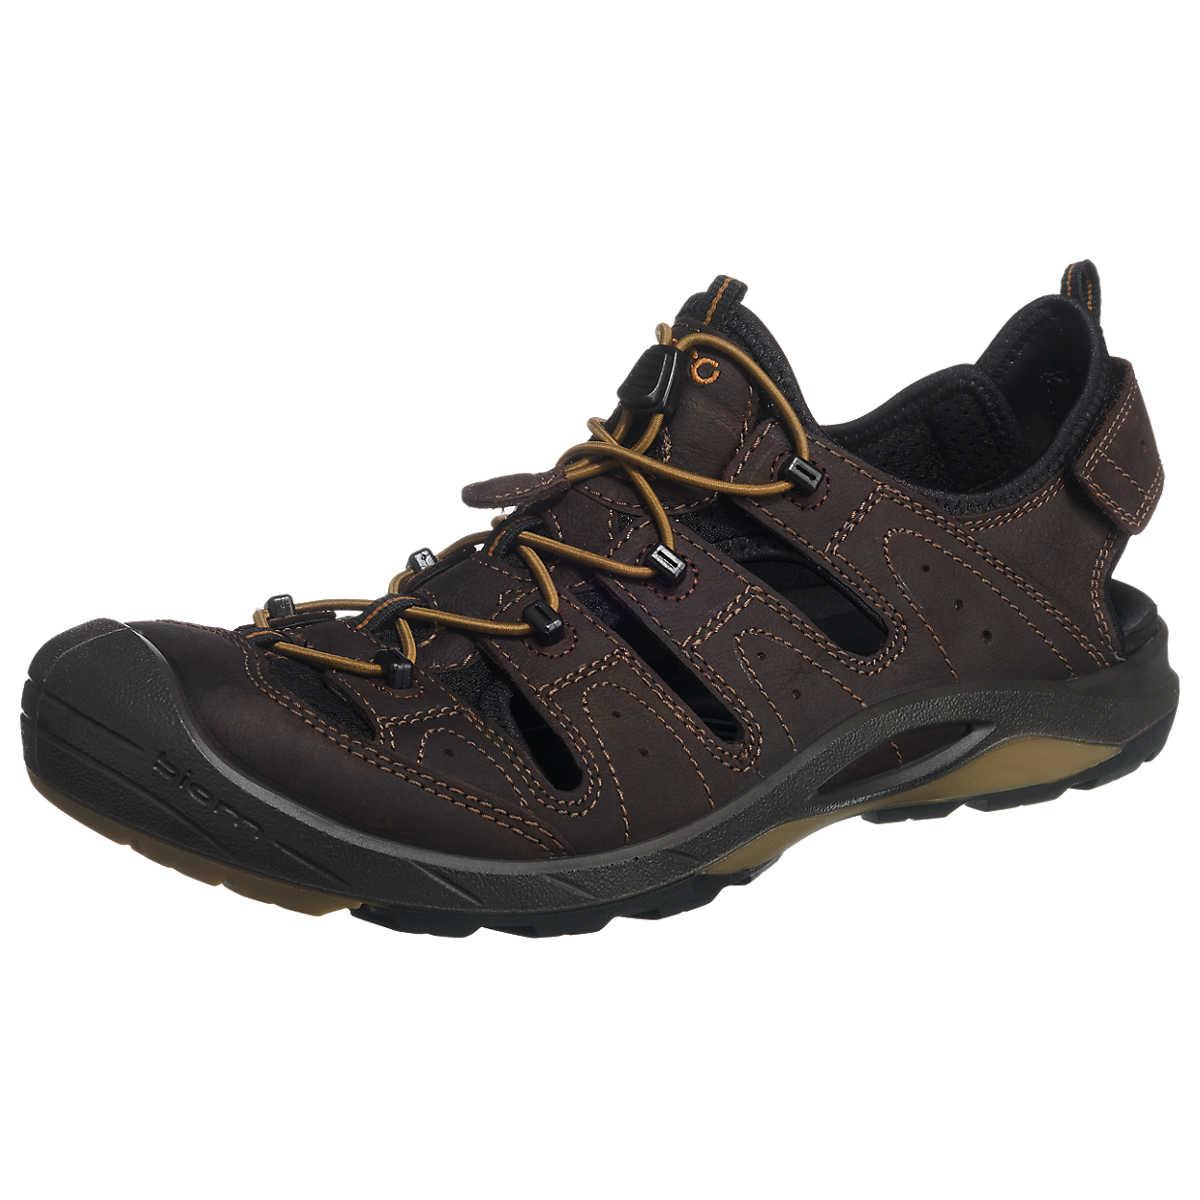 ecco Biom Delta Sandalen braun - ecco - Sandalen - Schuhe - mirapodo.de